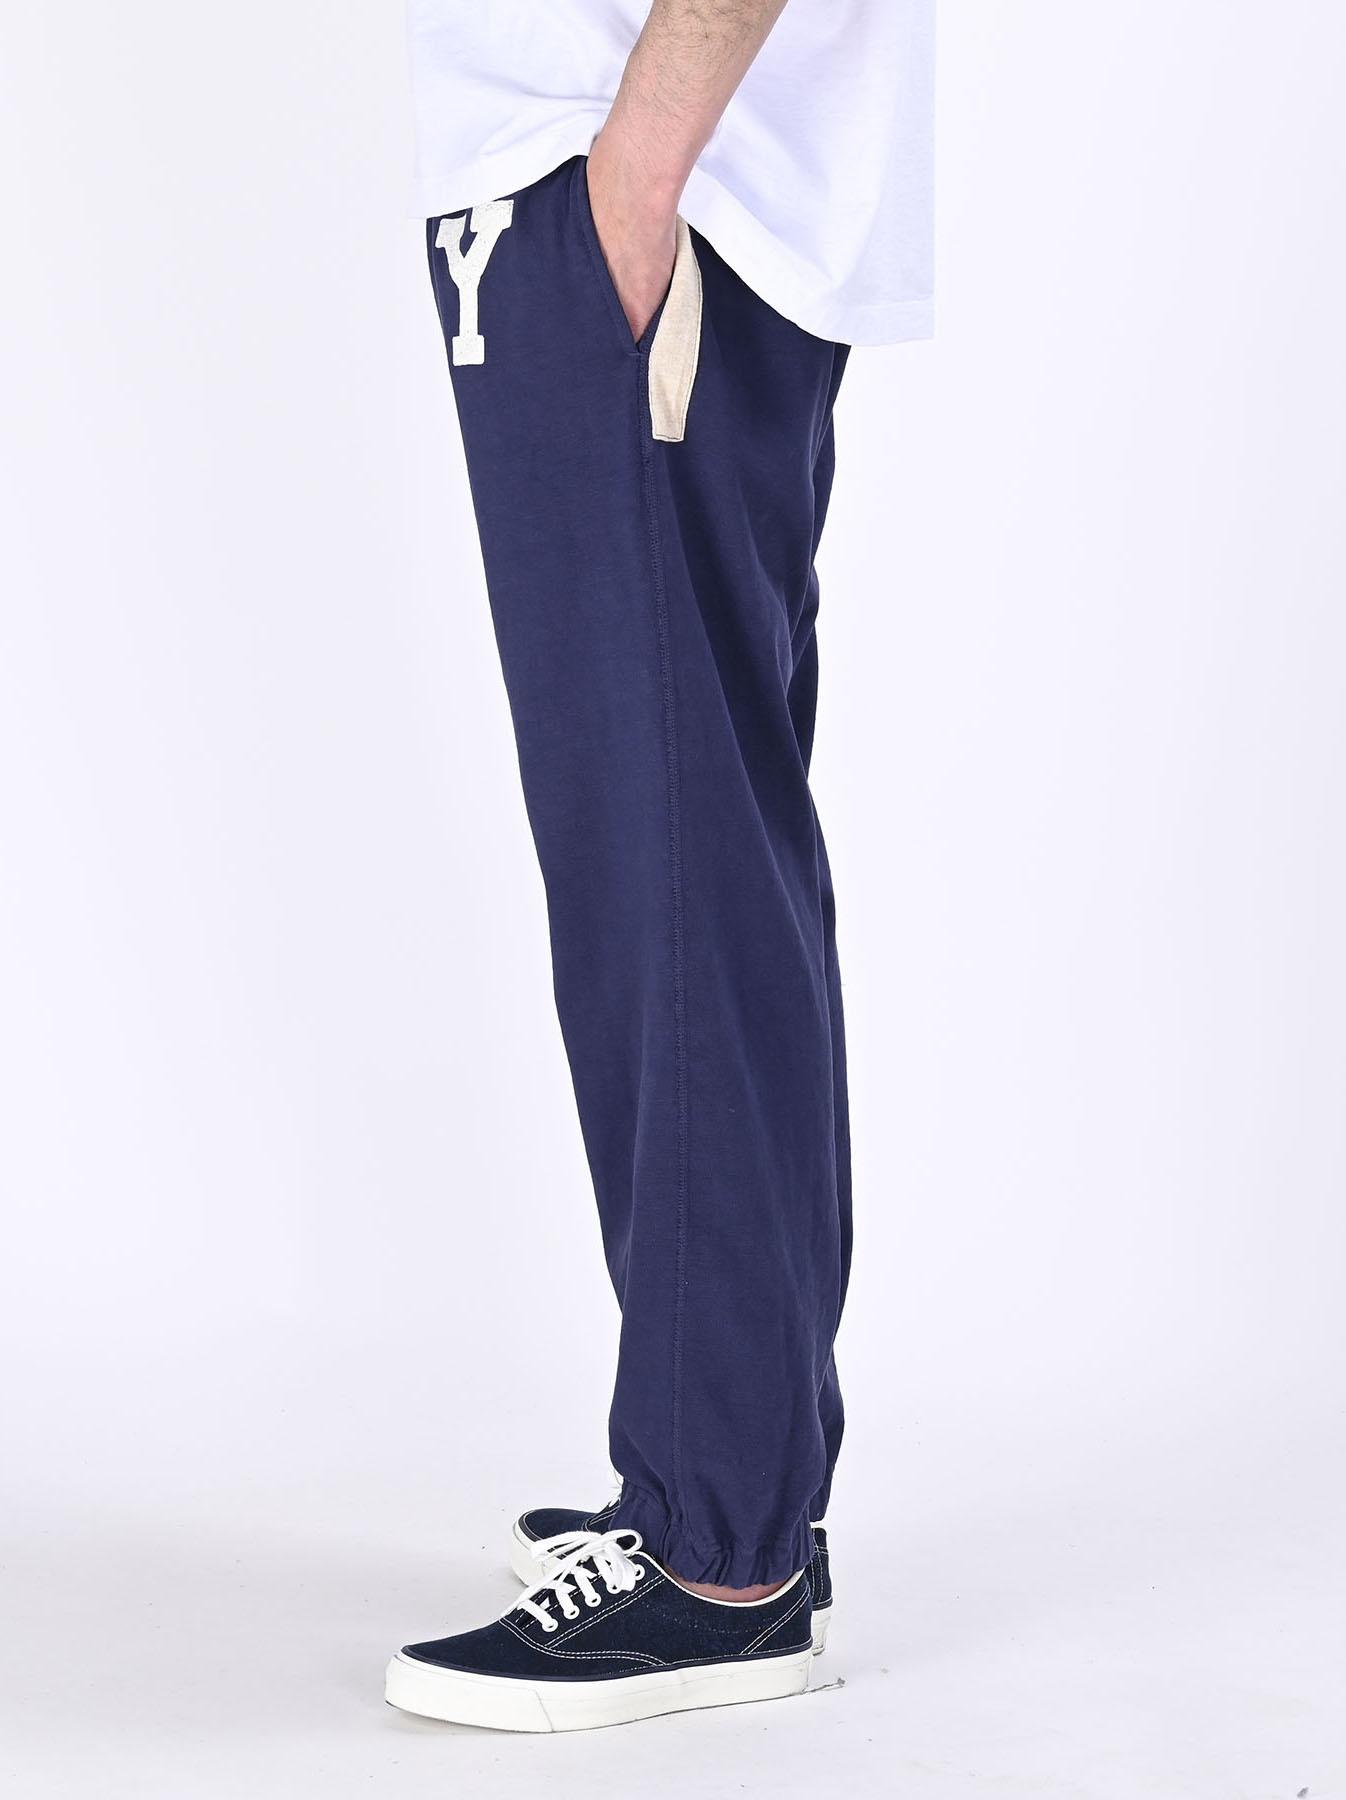 Dekoboko Tenjiku Regatta Pants (0621)-6